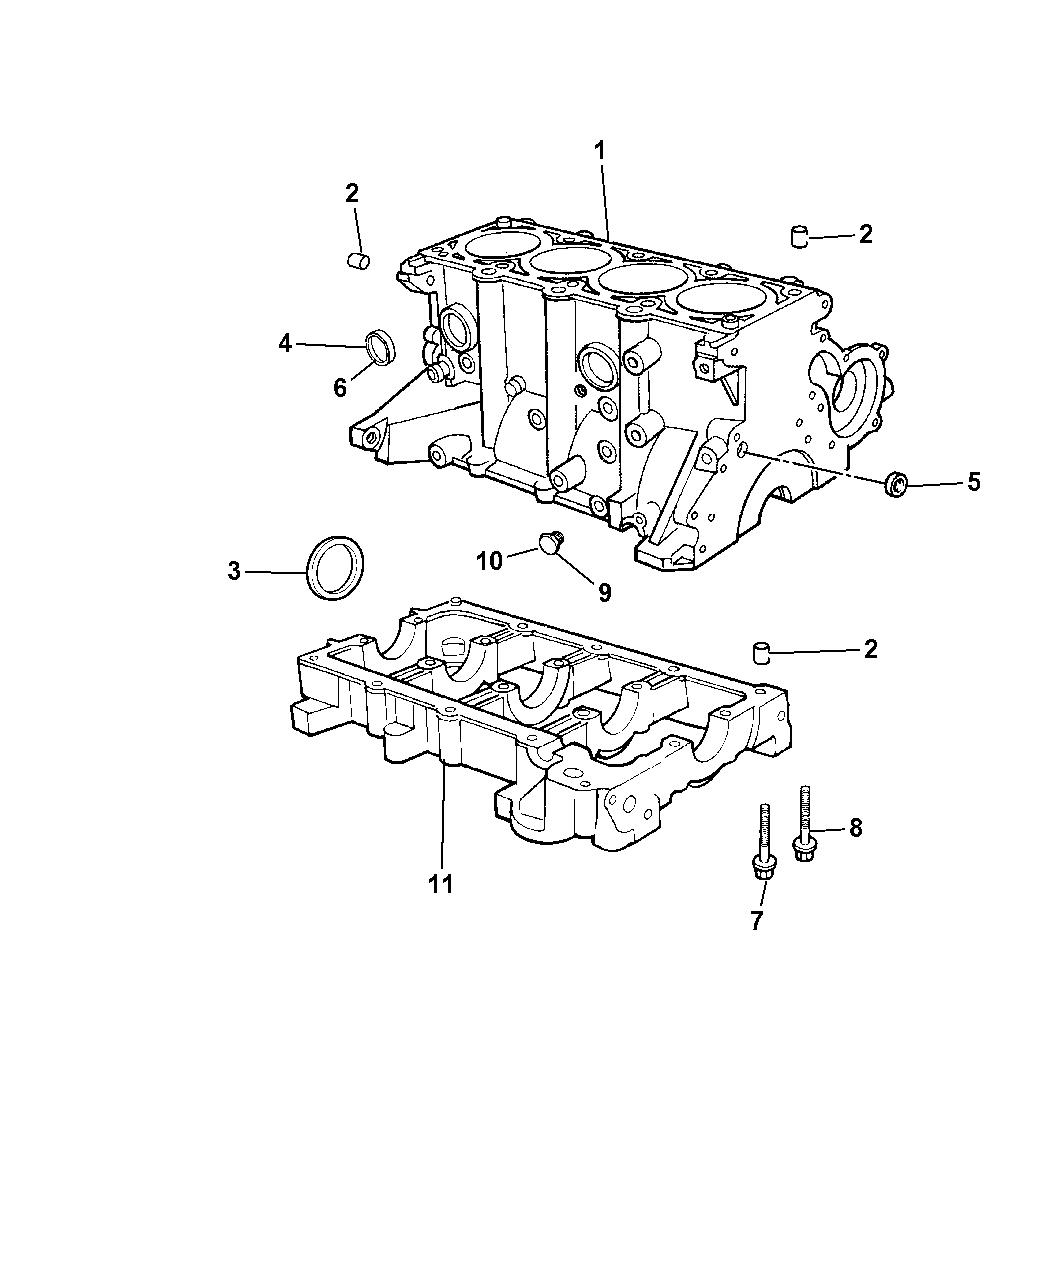 Chrysler Pt Cruiser Engine Cylinder Block Amp Hardware